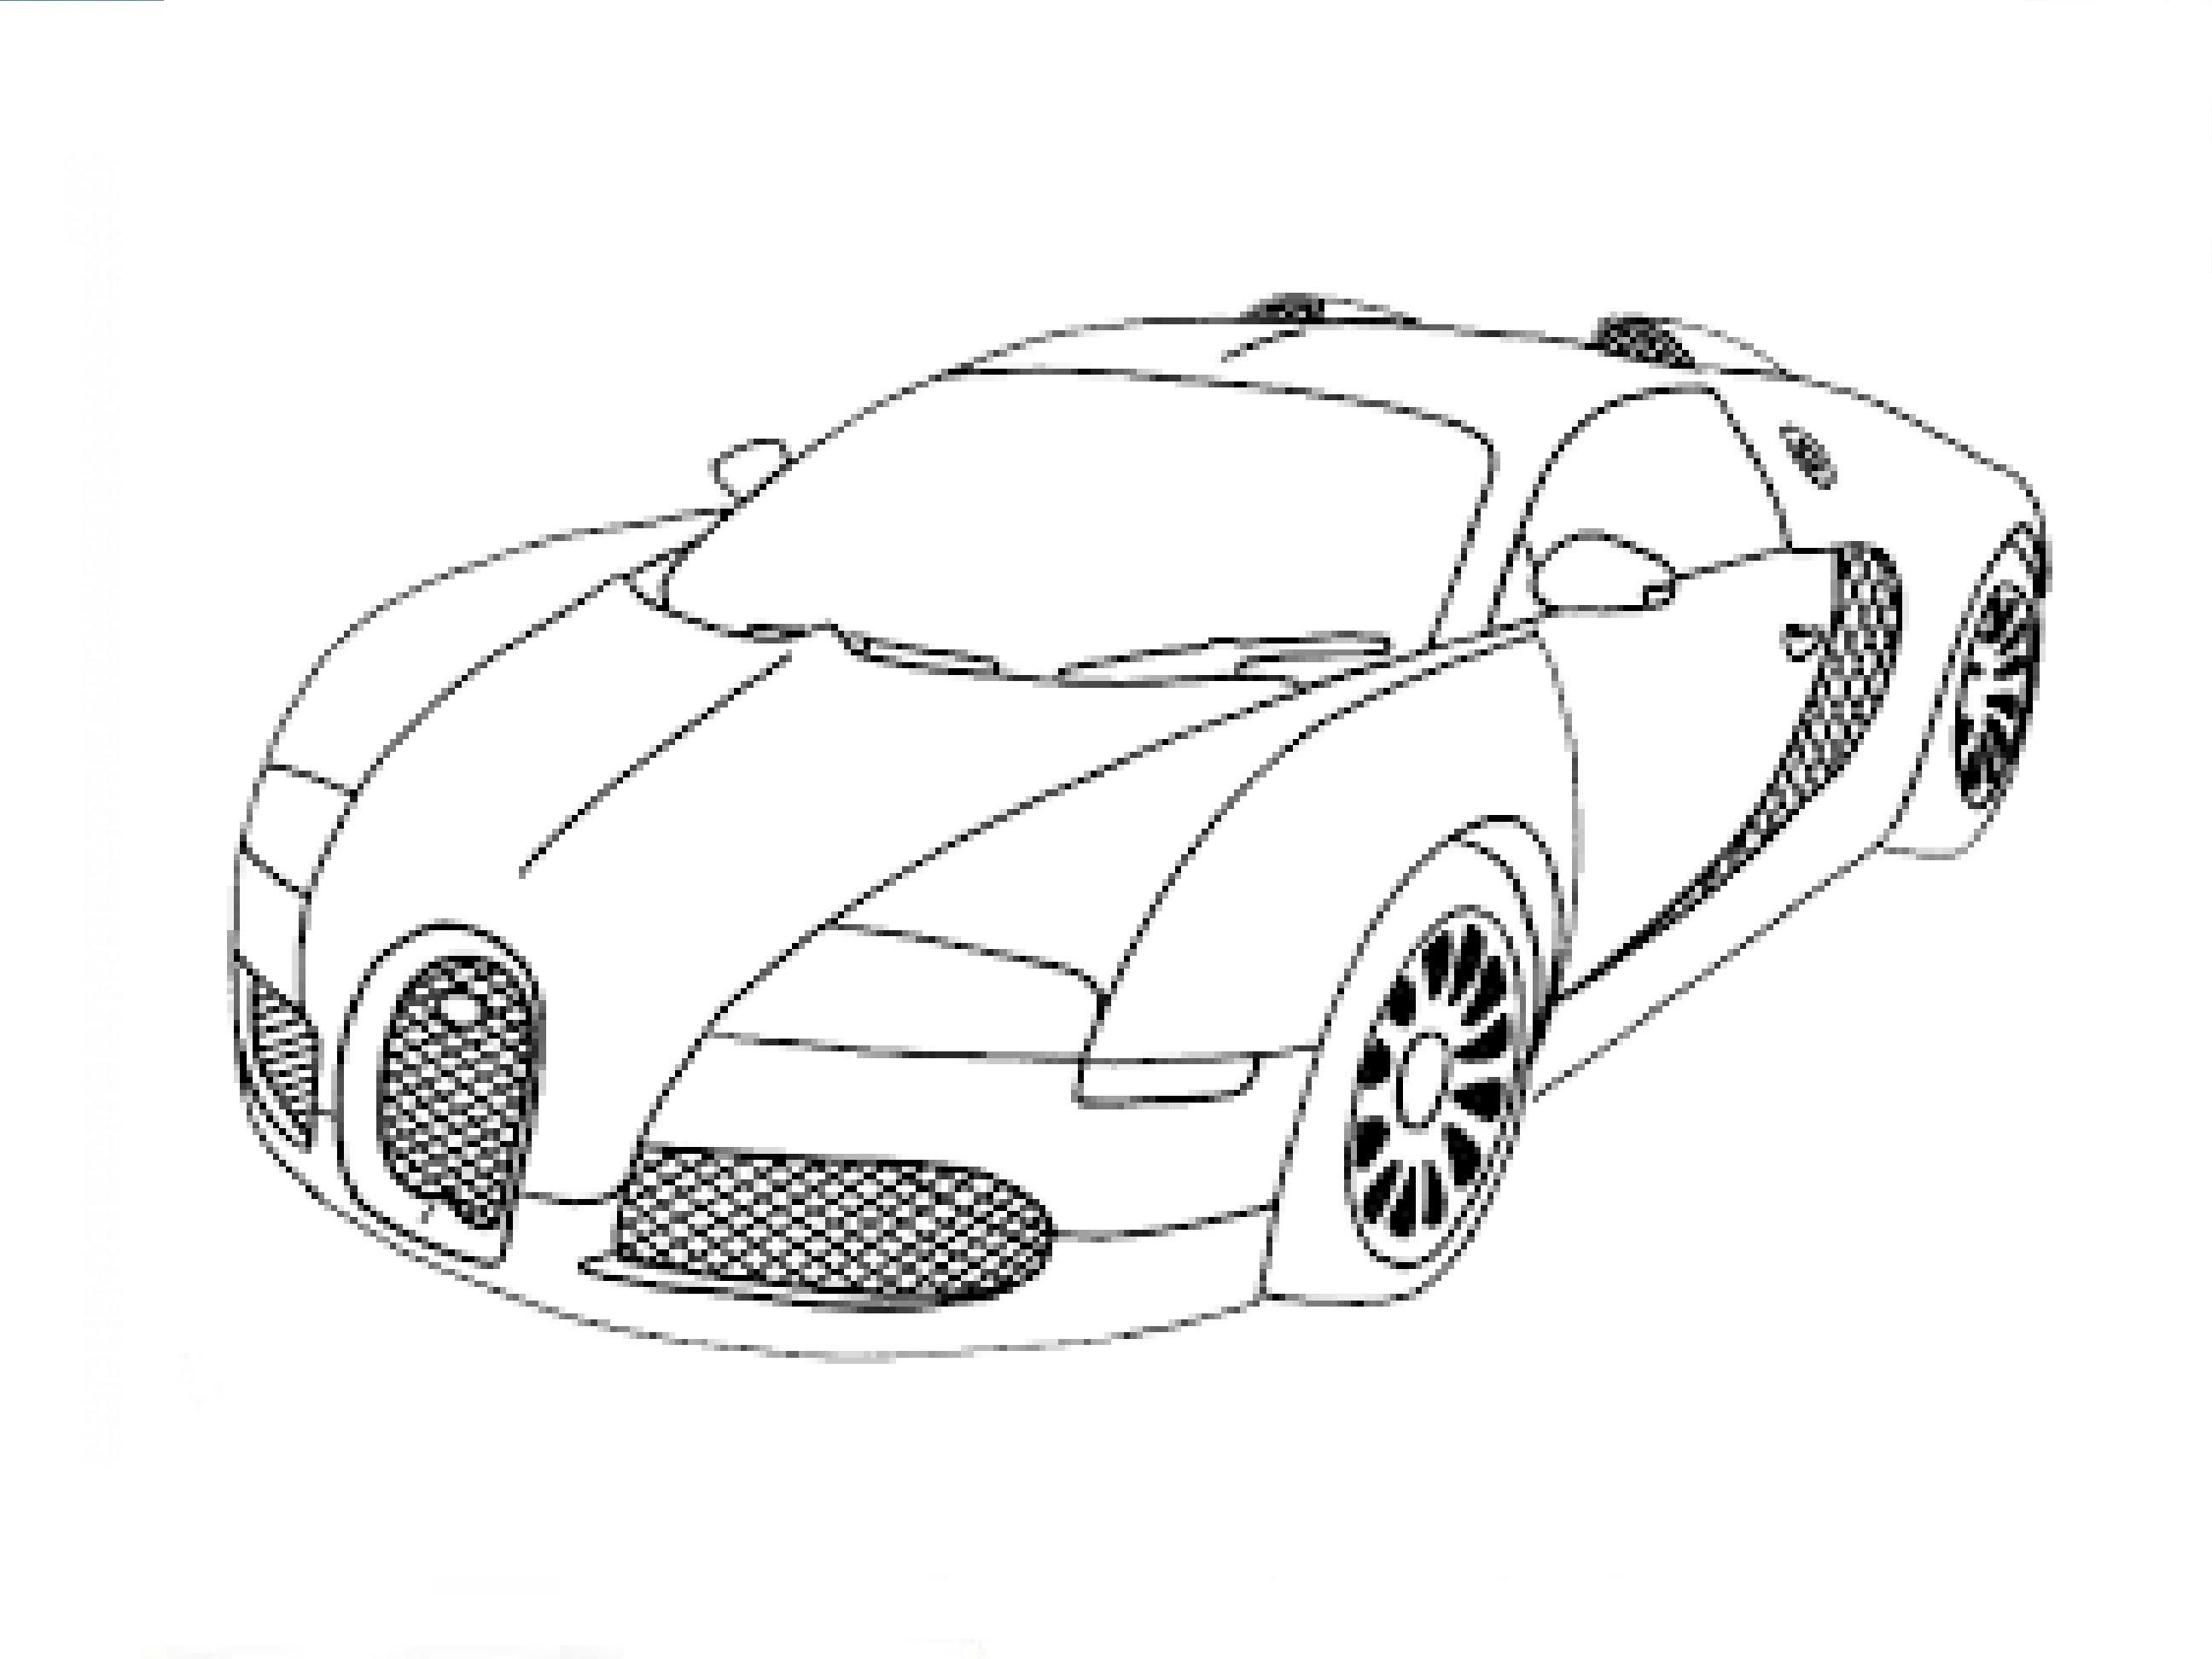 3d Car Drawing At Getdrawings